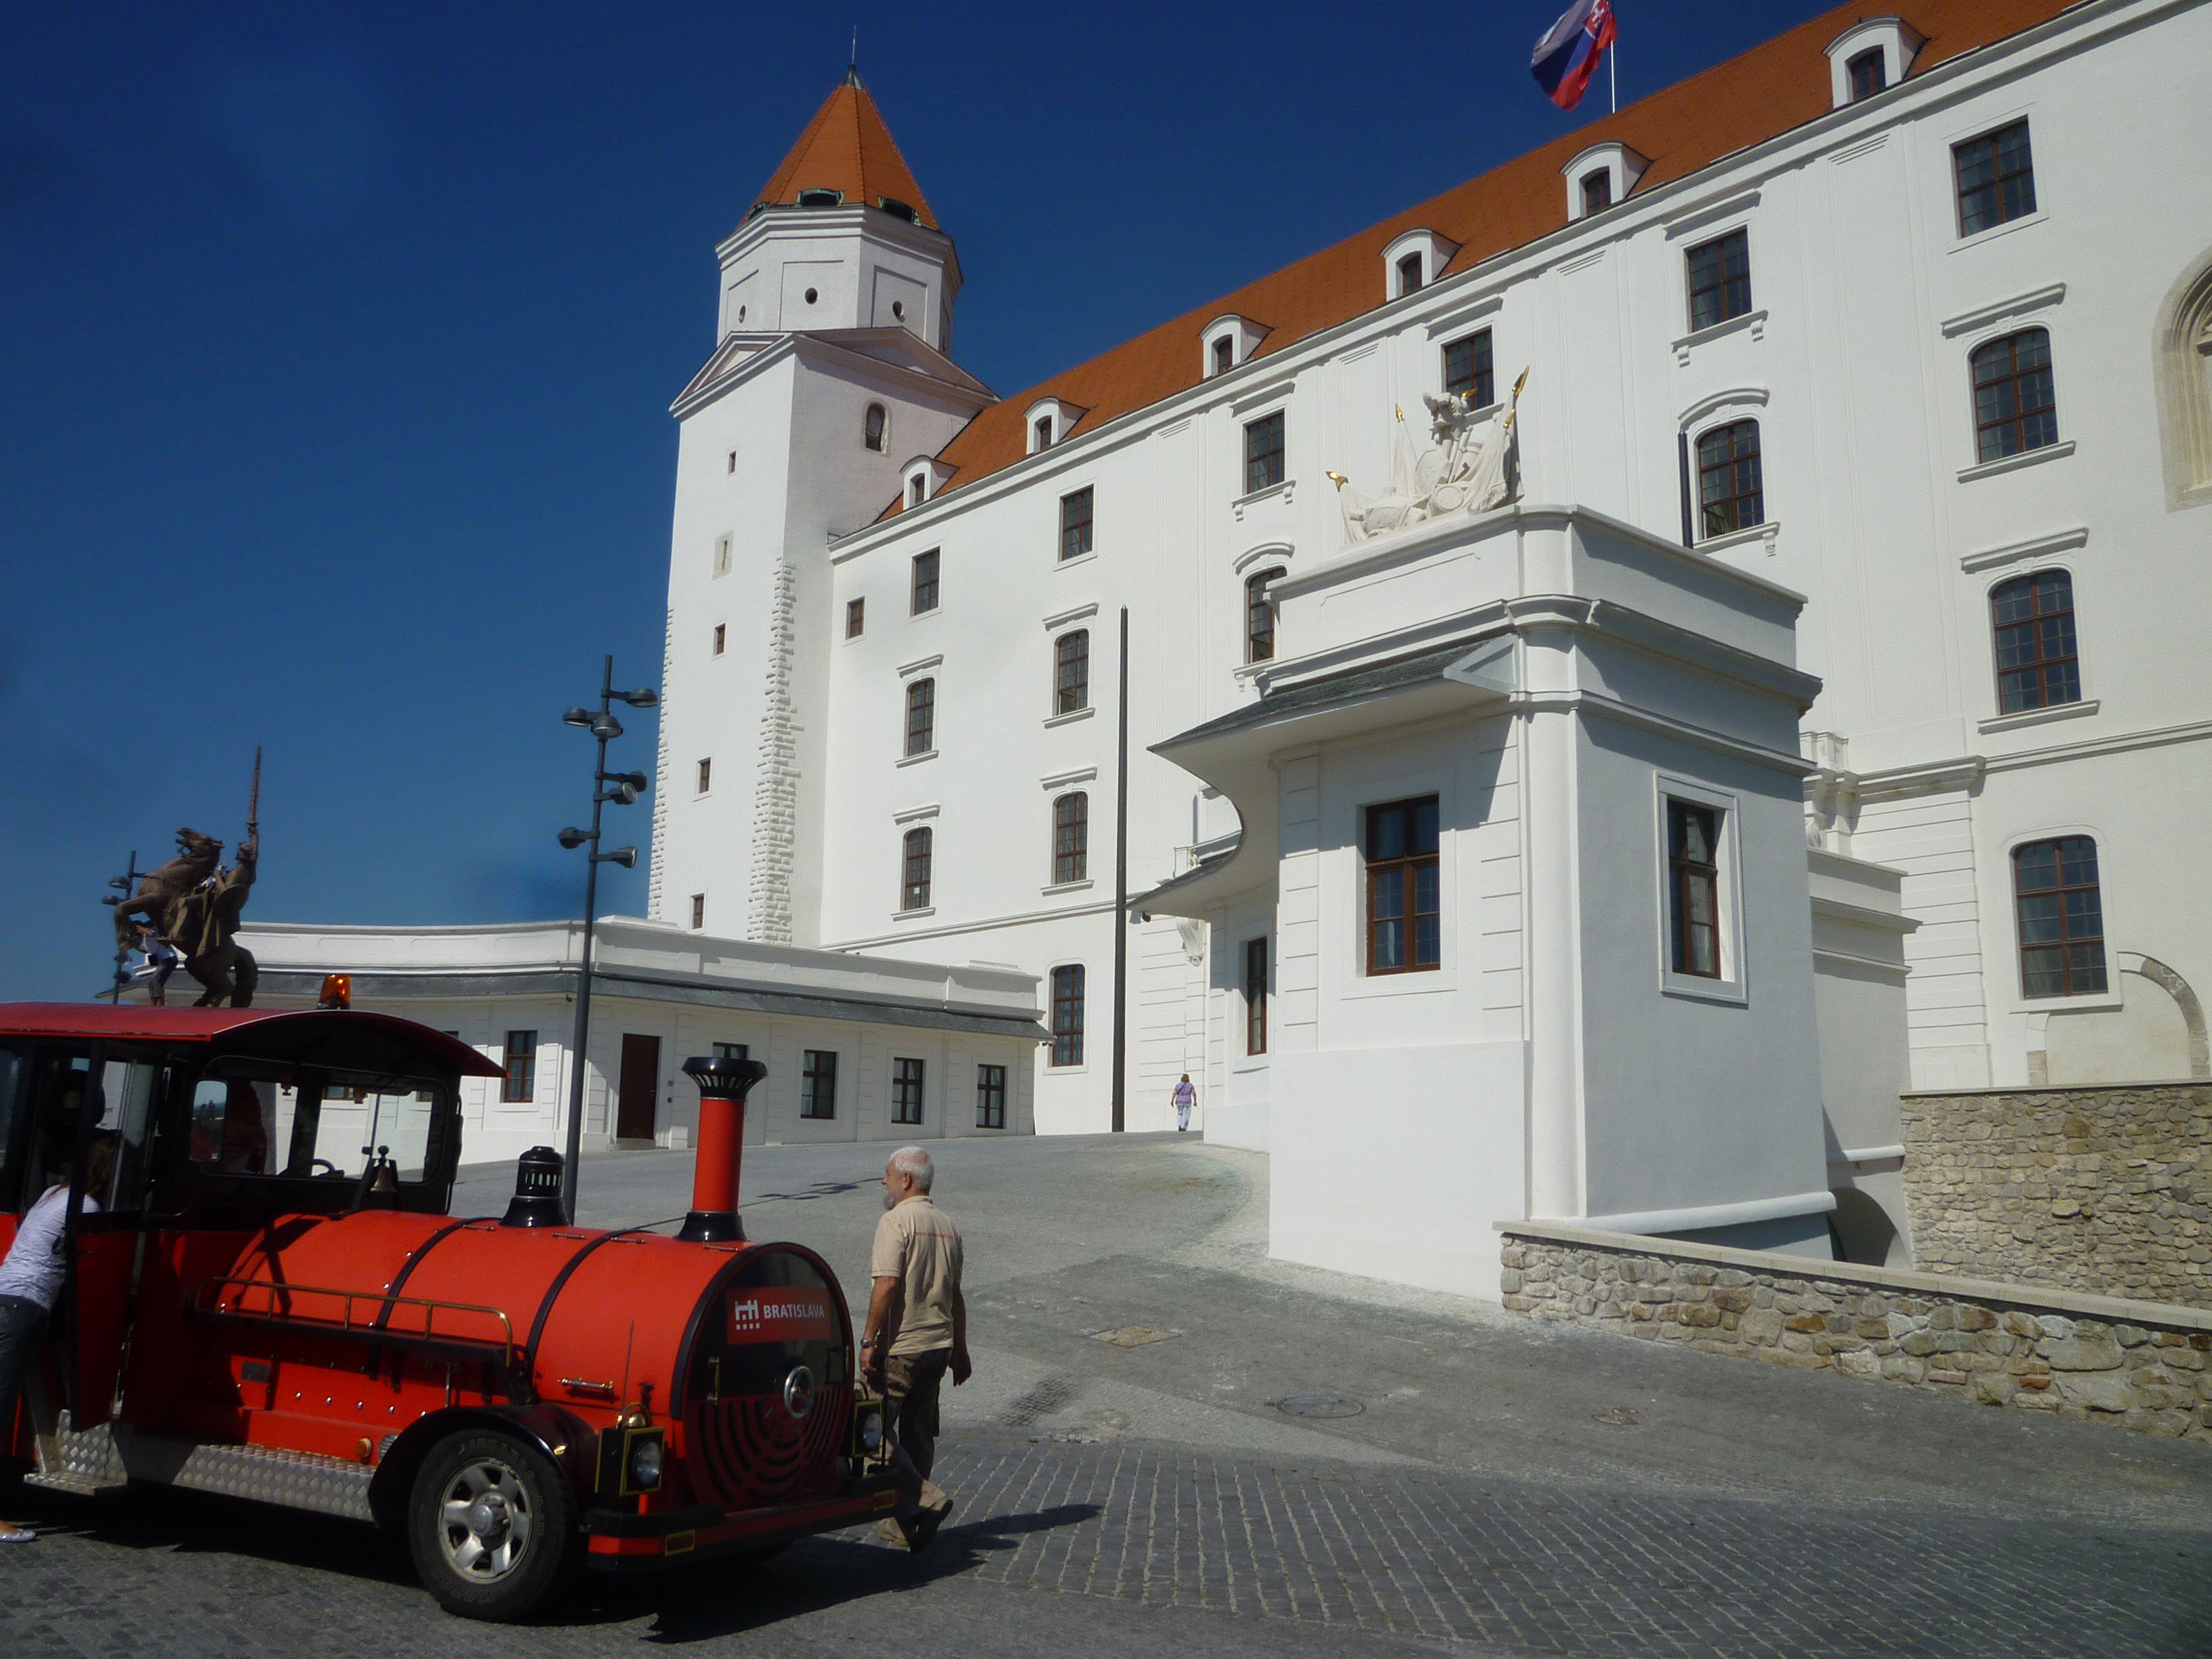 slovakia blue skies and churches in bratislava u2013 greenjoy travel